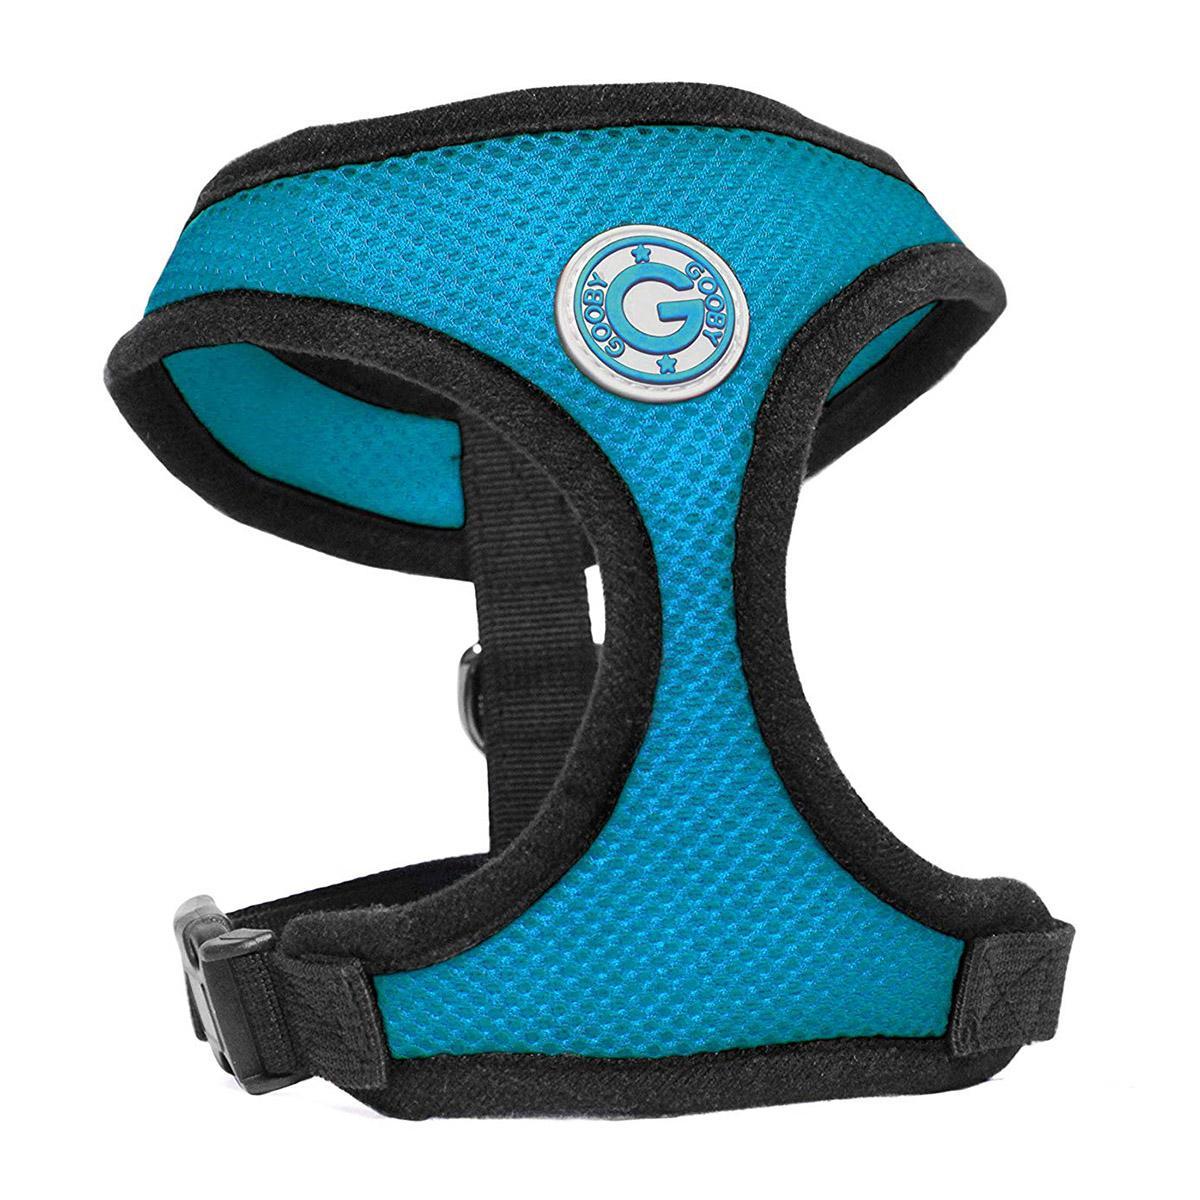 Gooby Soft Mesh Dog Harness - Sea Blue